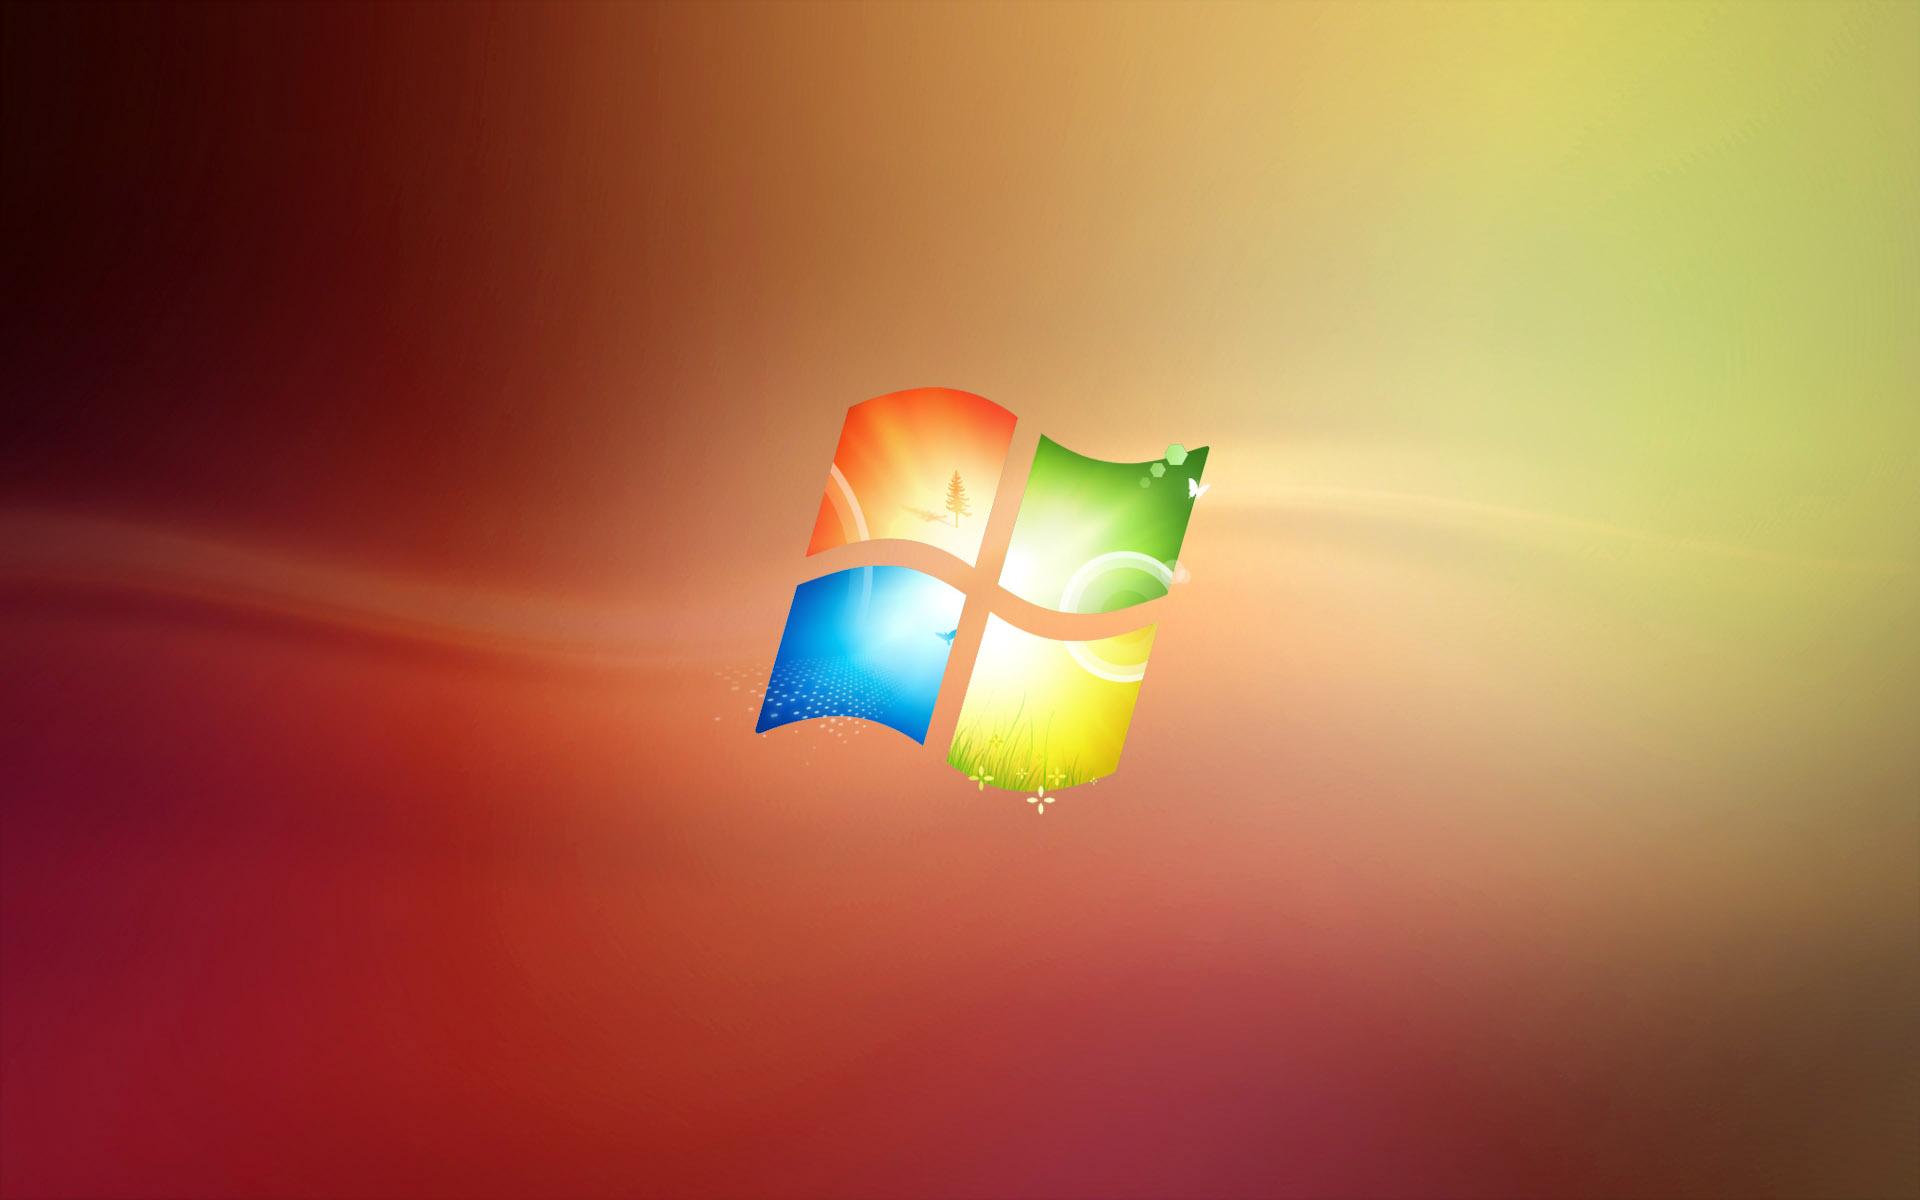 Windows Desktop Wallpapers Group 91